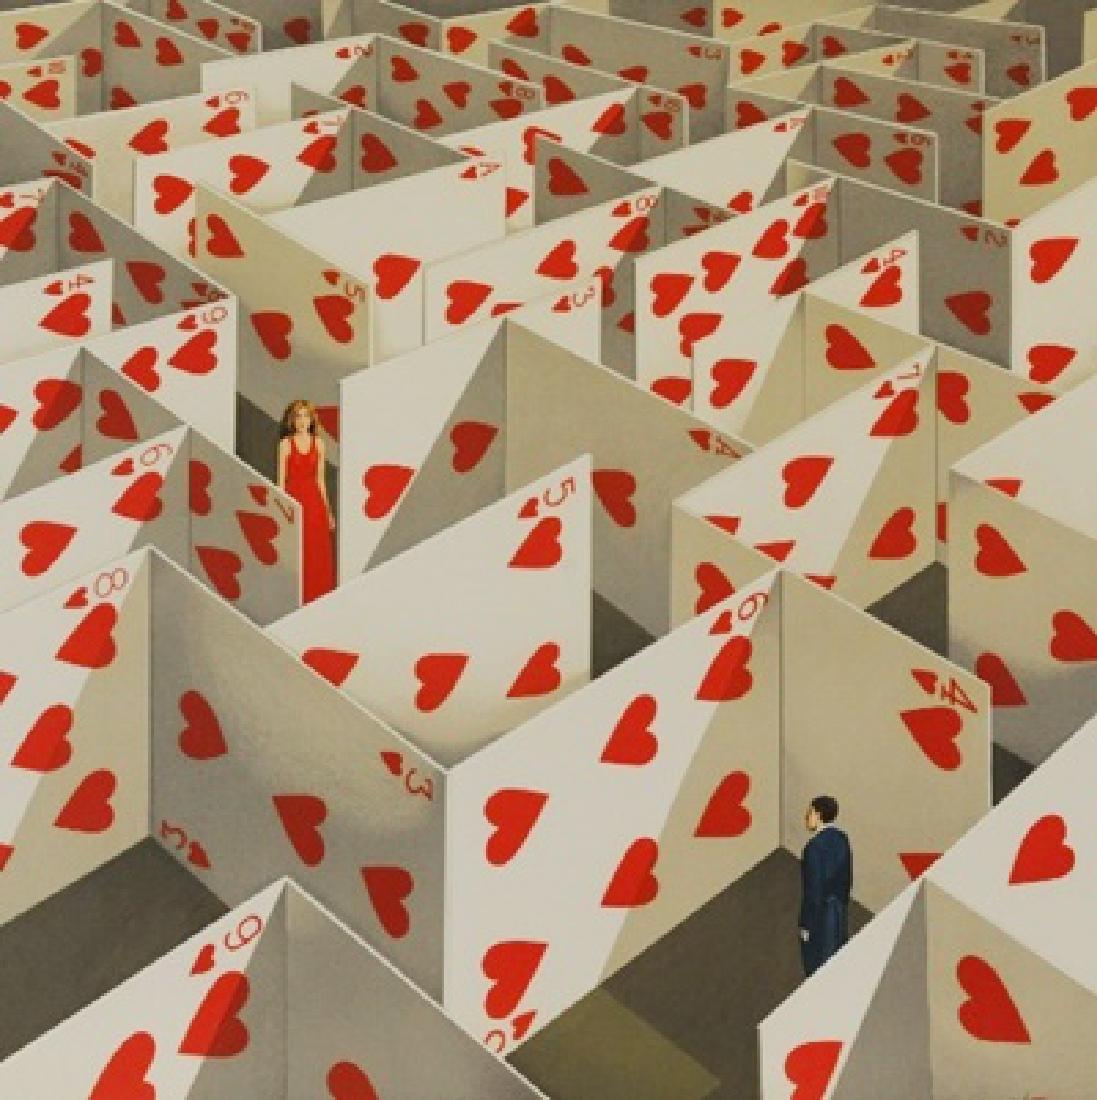 Rafal Olbinski - Illusive Specifity of Random